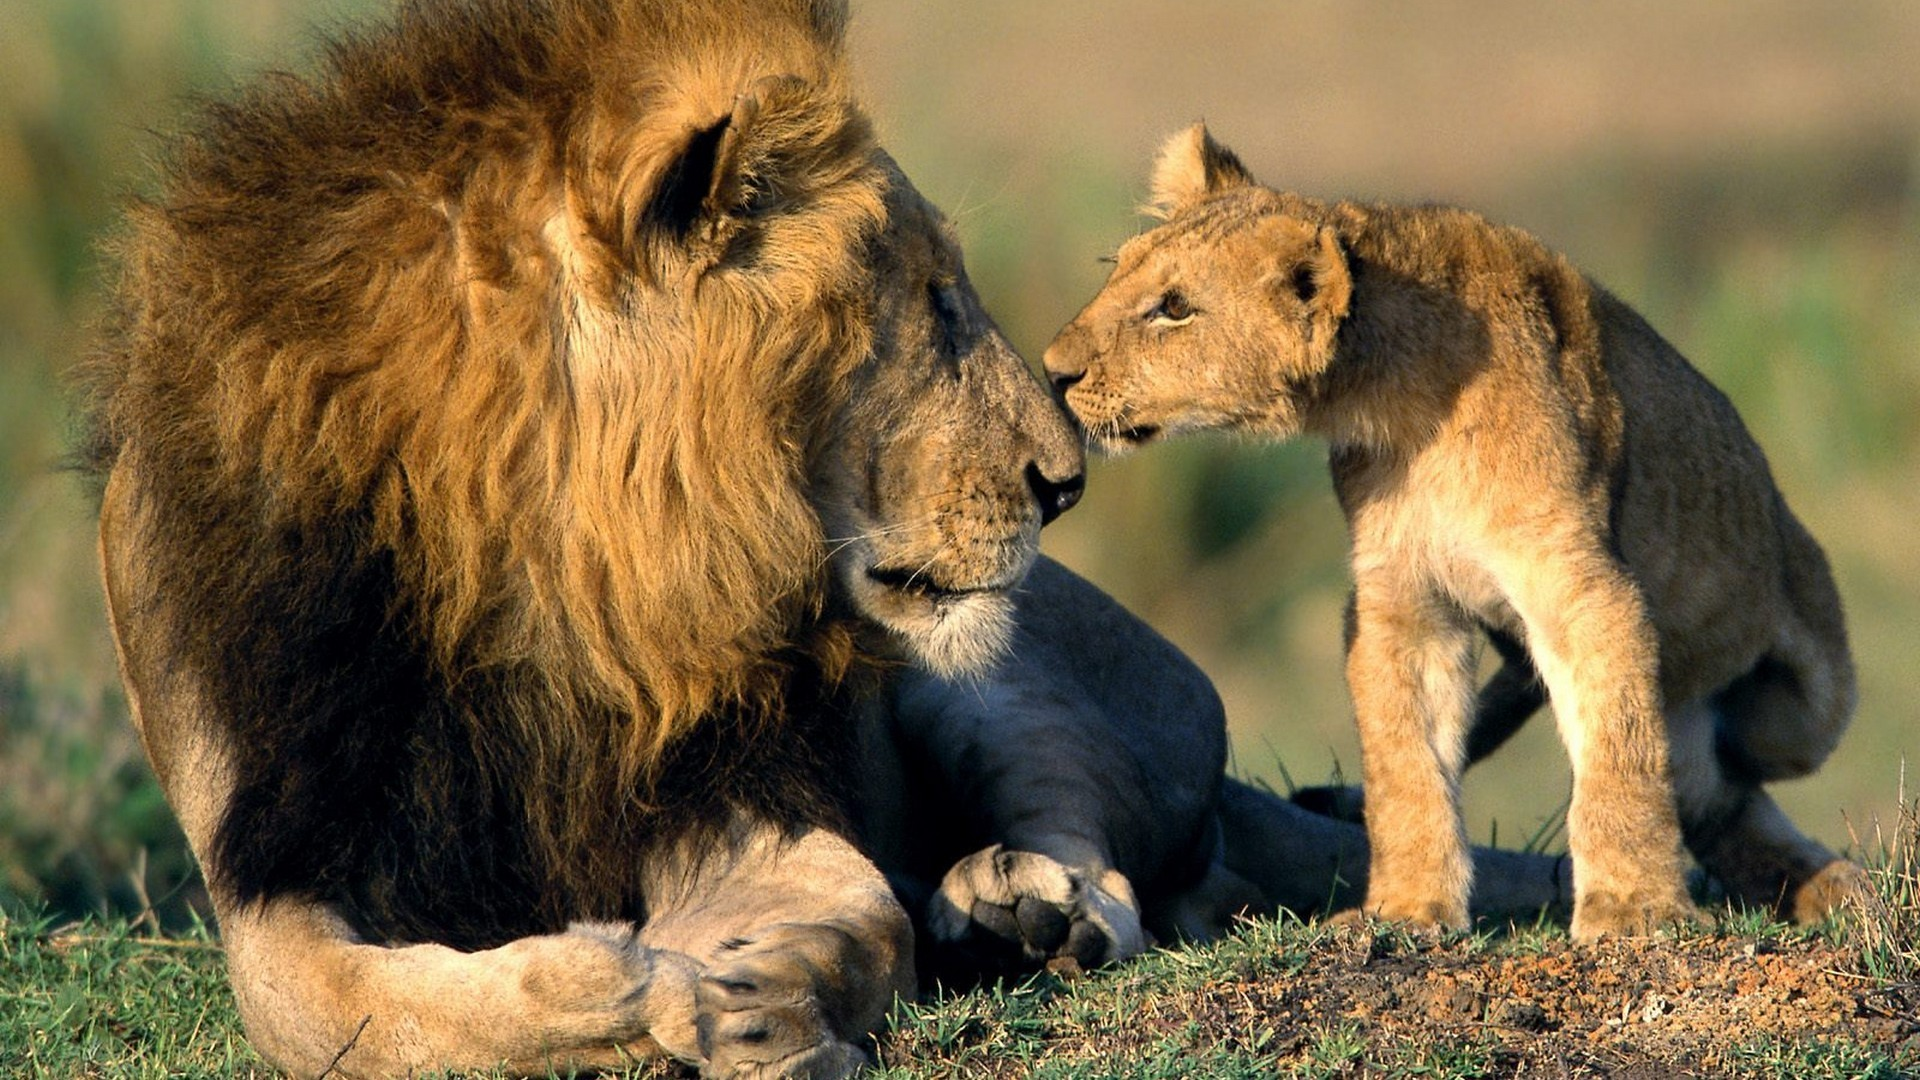 Lion Love HD wallpaper